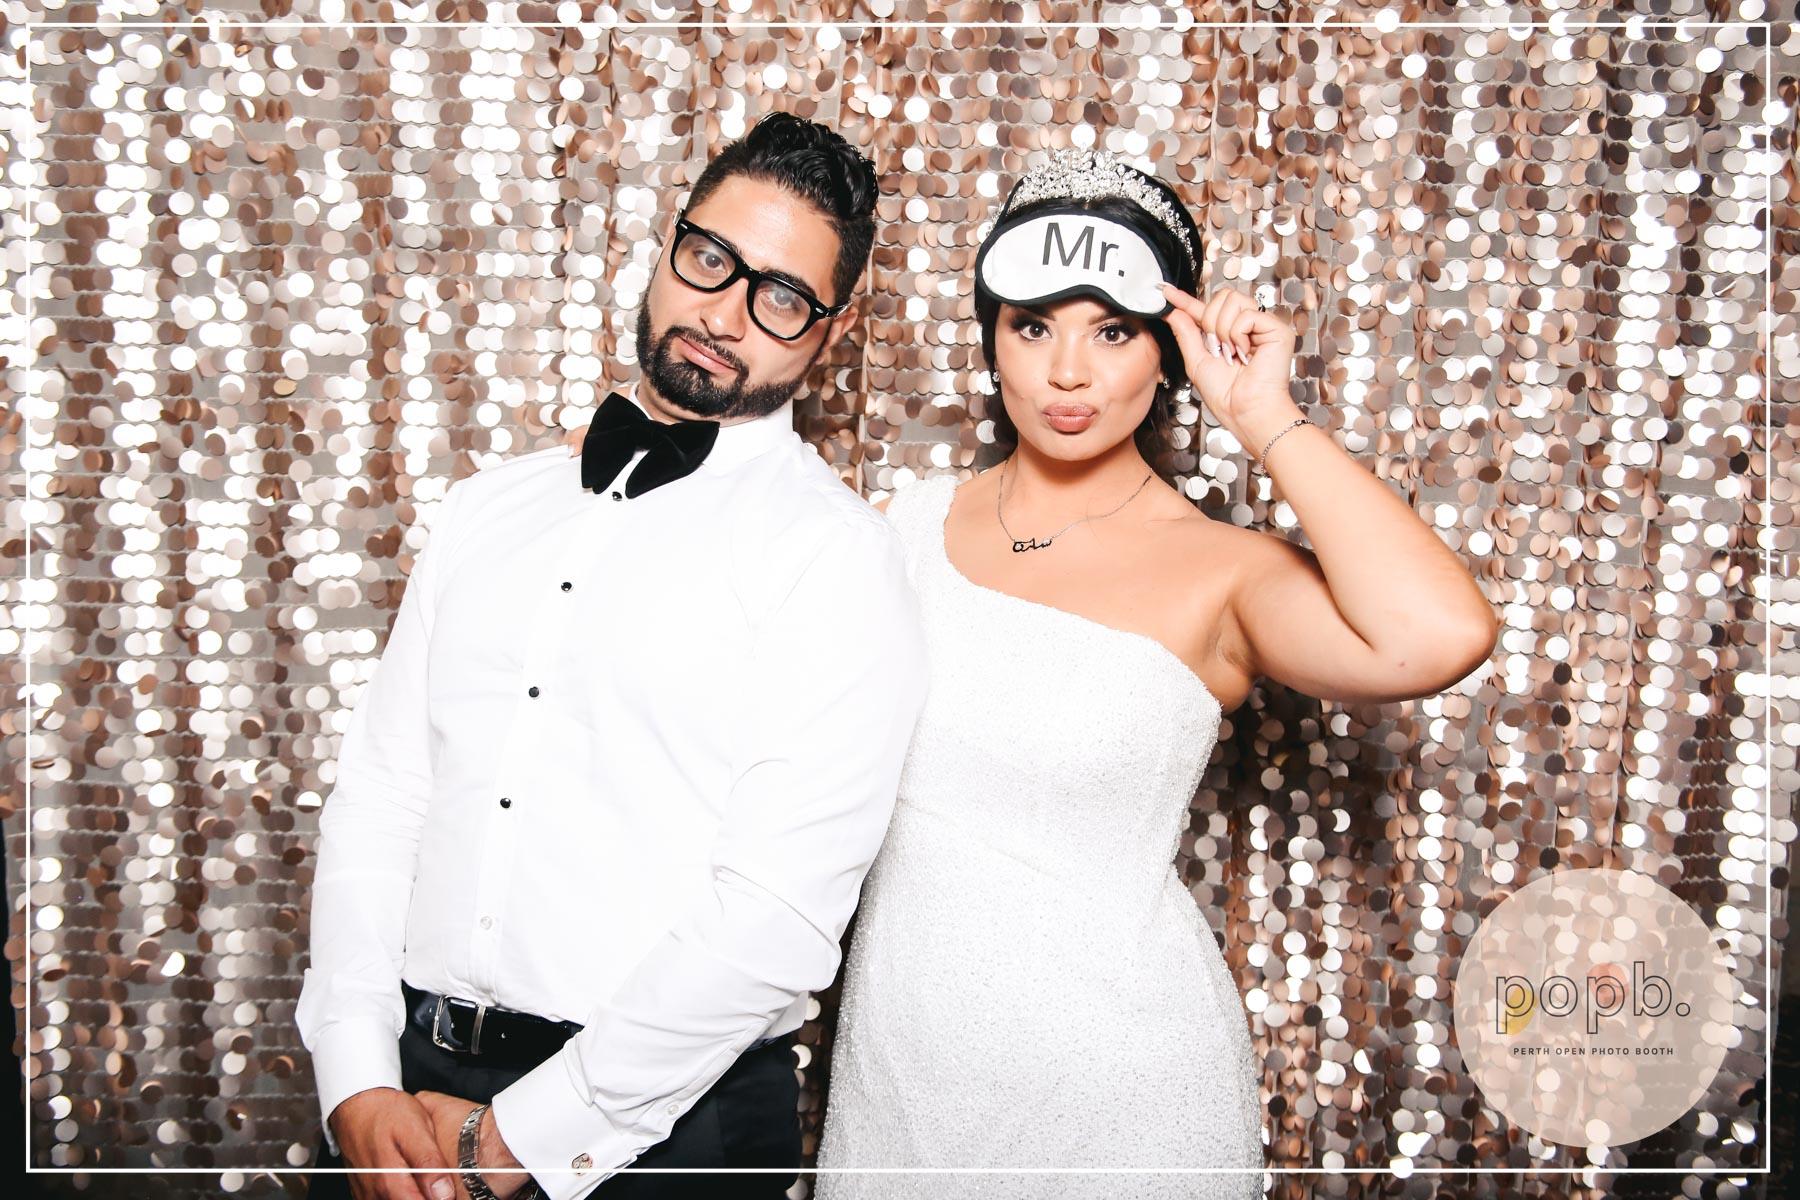 Sharon + ibrahim's Wedding - PASSWORD: PROVIDED ON THE NIGHT- ALL LOWERCASE -